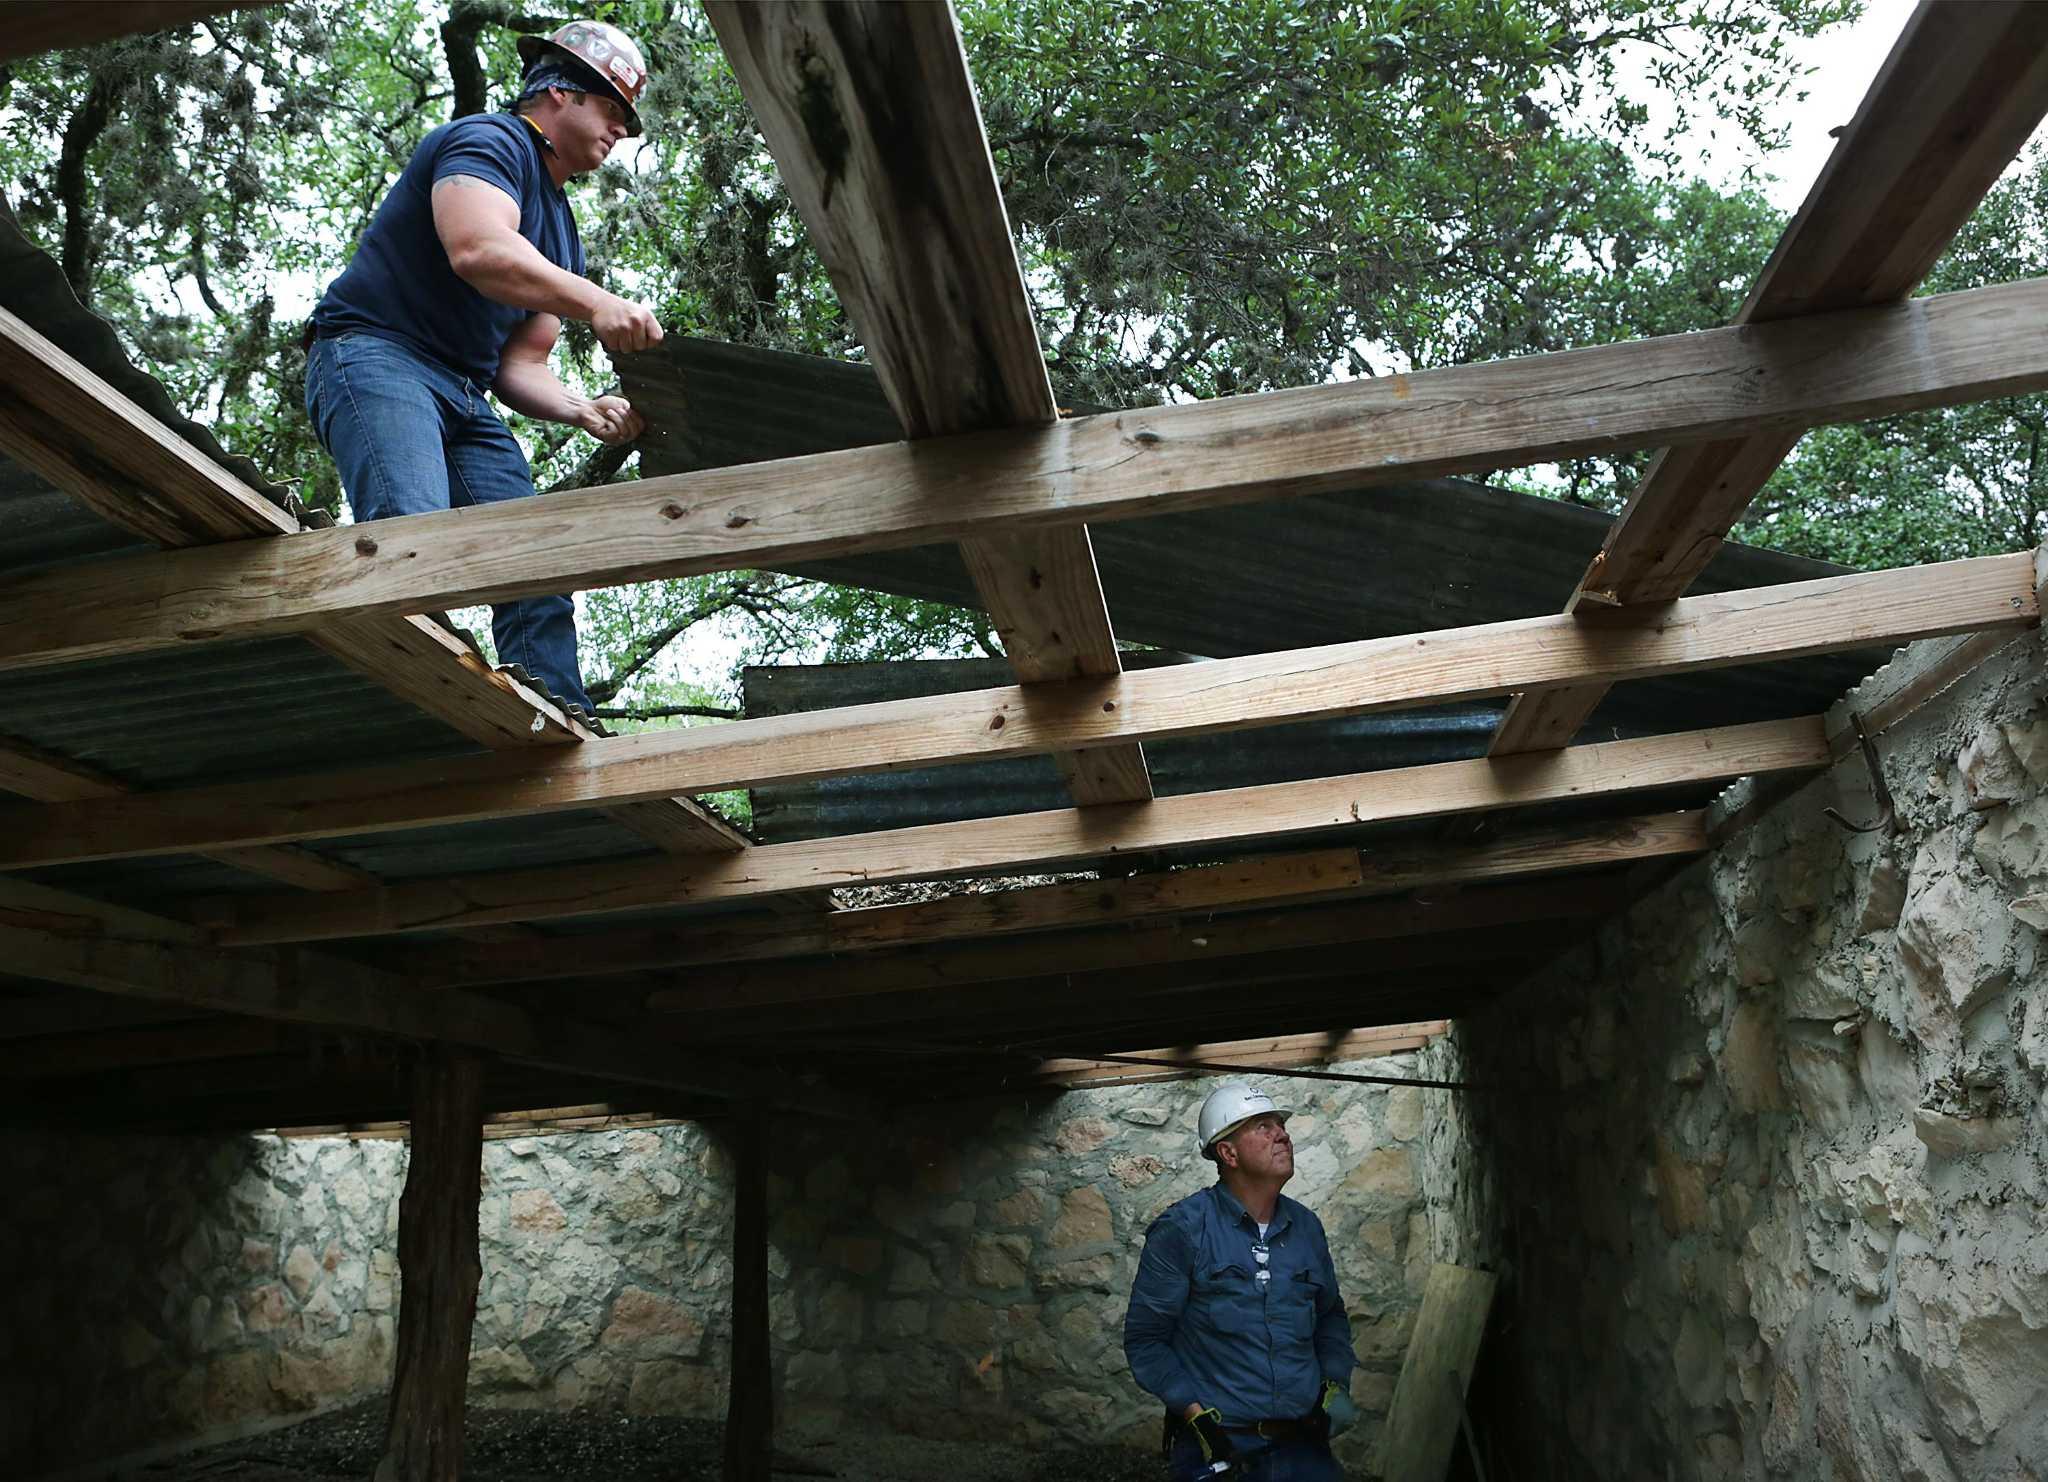 Corpus Christi Jumbo Project 100 Million Headache For U S Texas Companies San Antonio